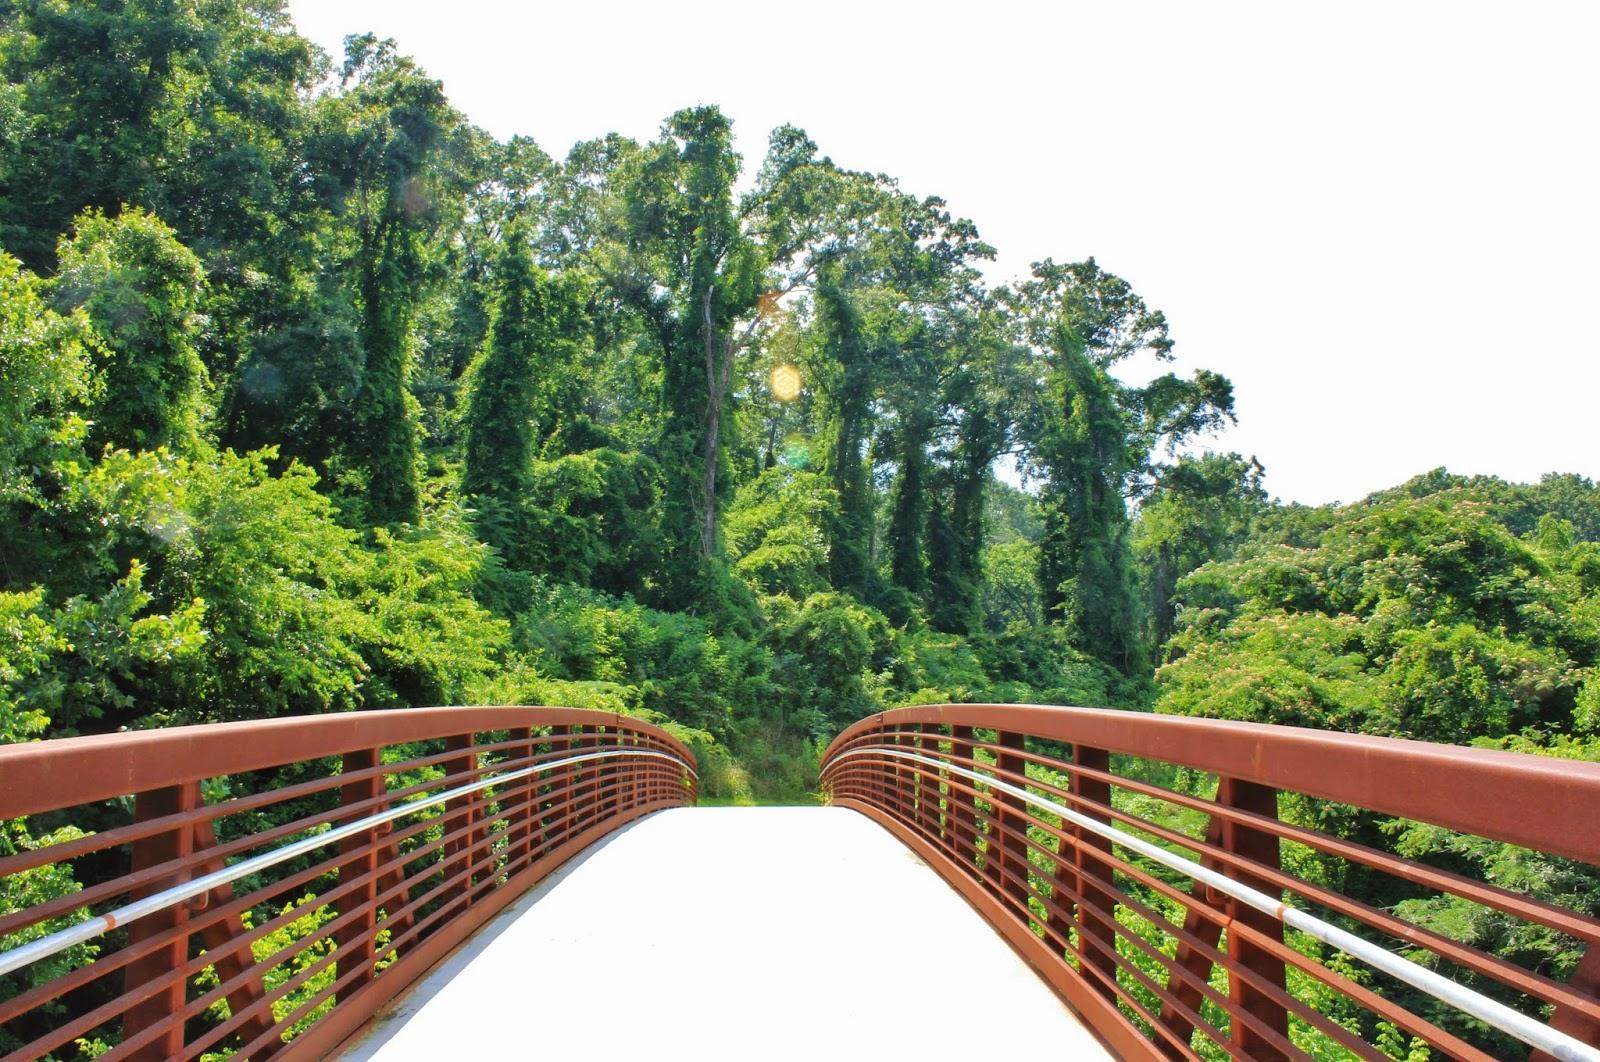 Pin Parasol Distance Maison rome – kingfisher trail & heritage park trail – southern civil